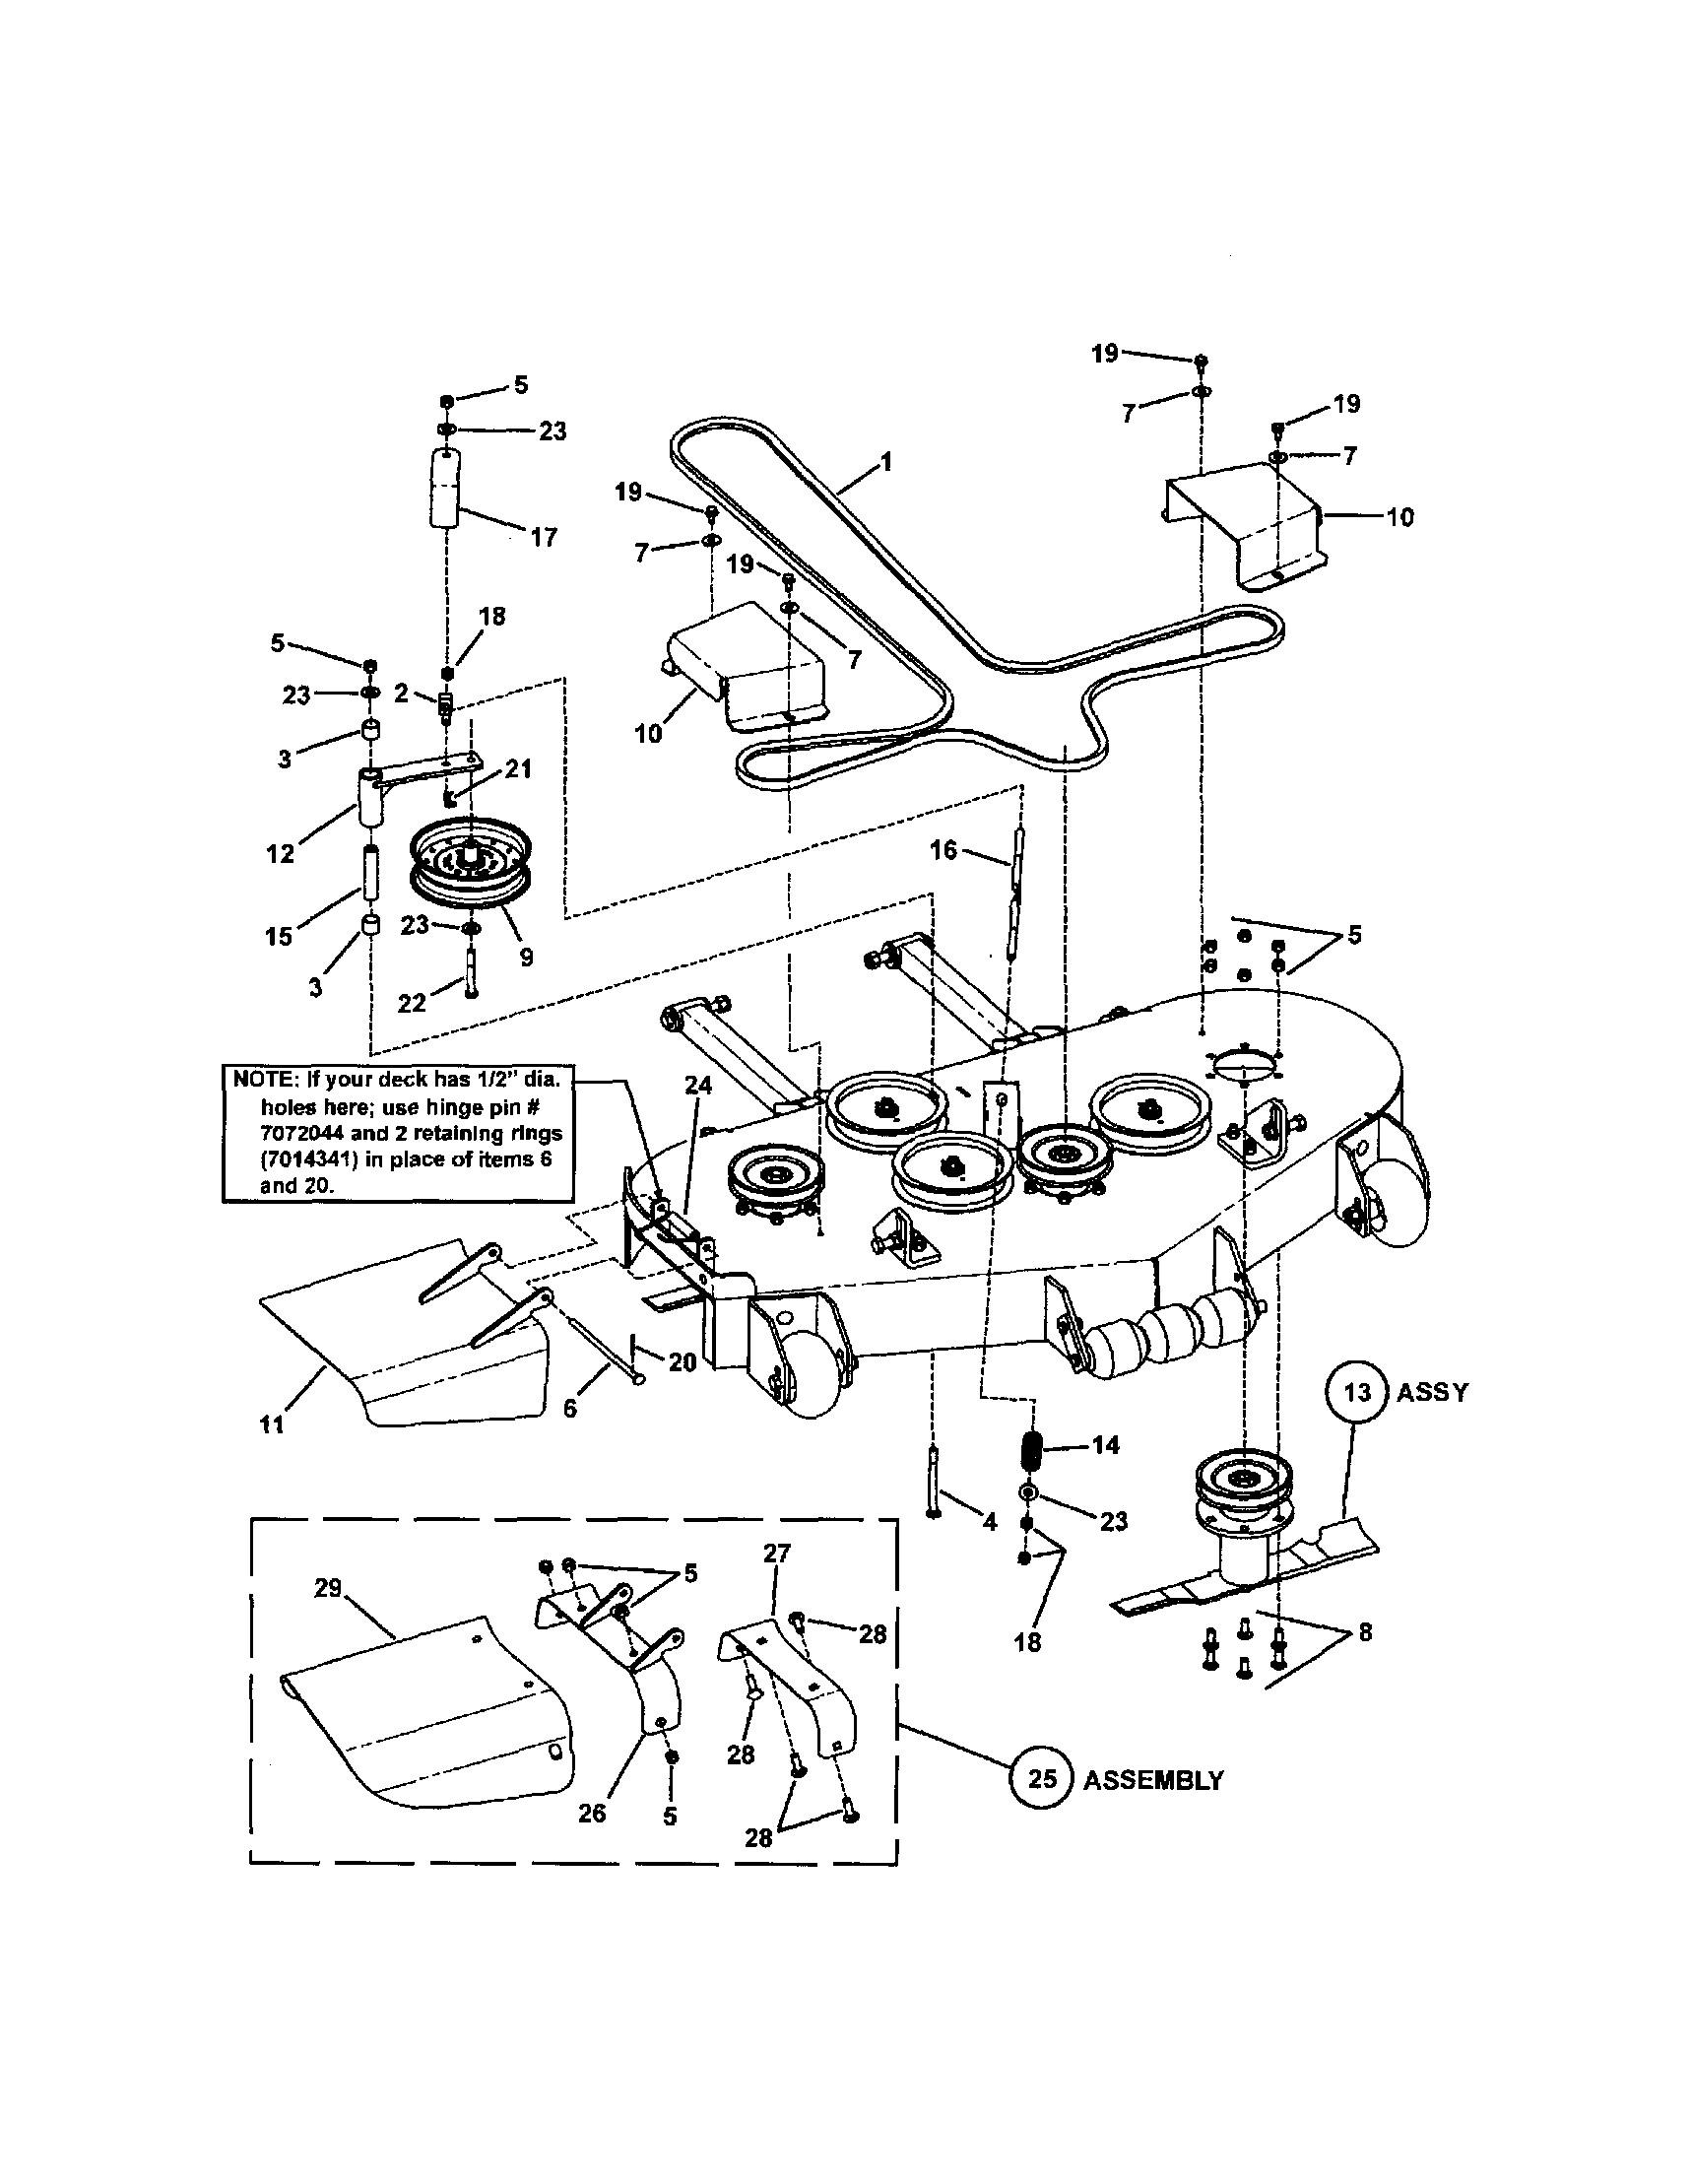 Diagram Ford Laser 2000 Wiring Diagram Full Version Hd Quality Wiring Diagram Electrocardiagram Belleilmersion Fr